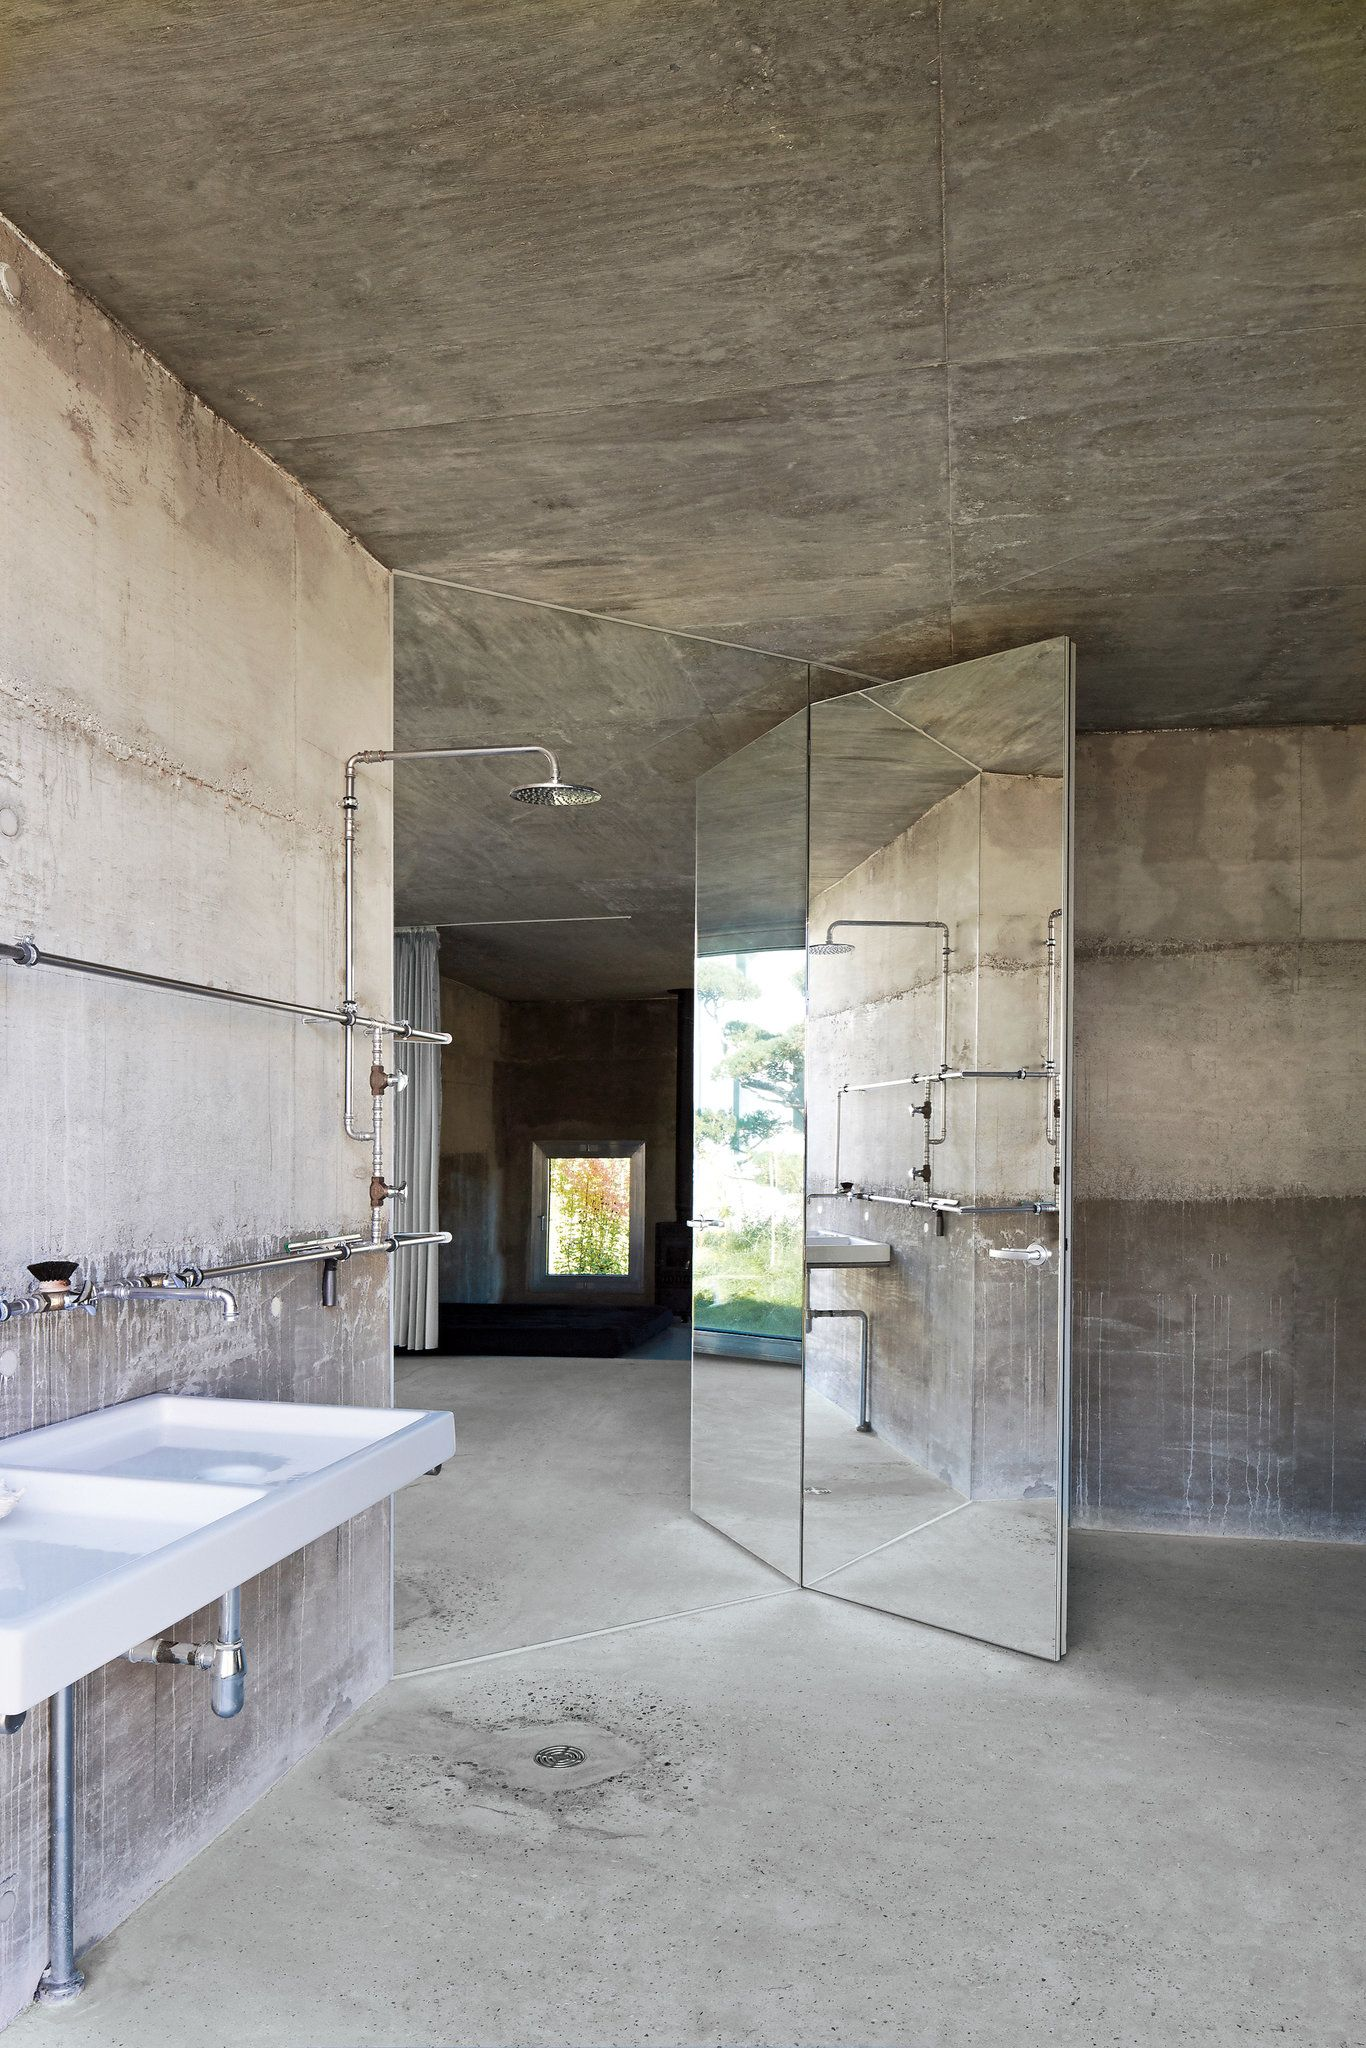 Inside Arno Brandlhuberu0027s Potsdam Bunker